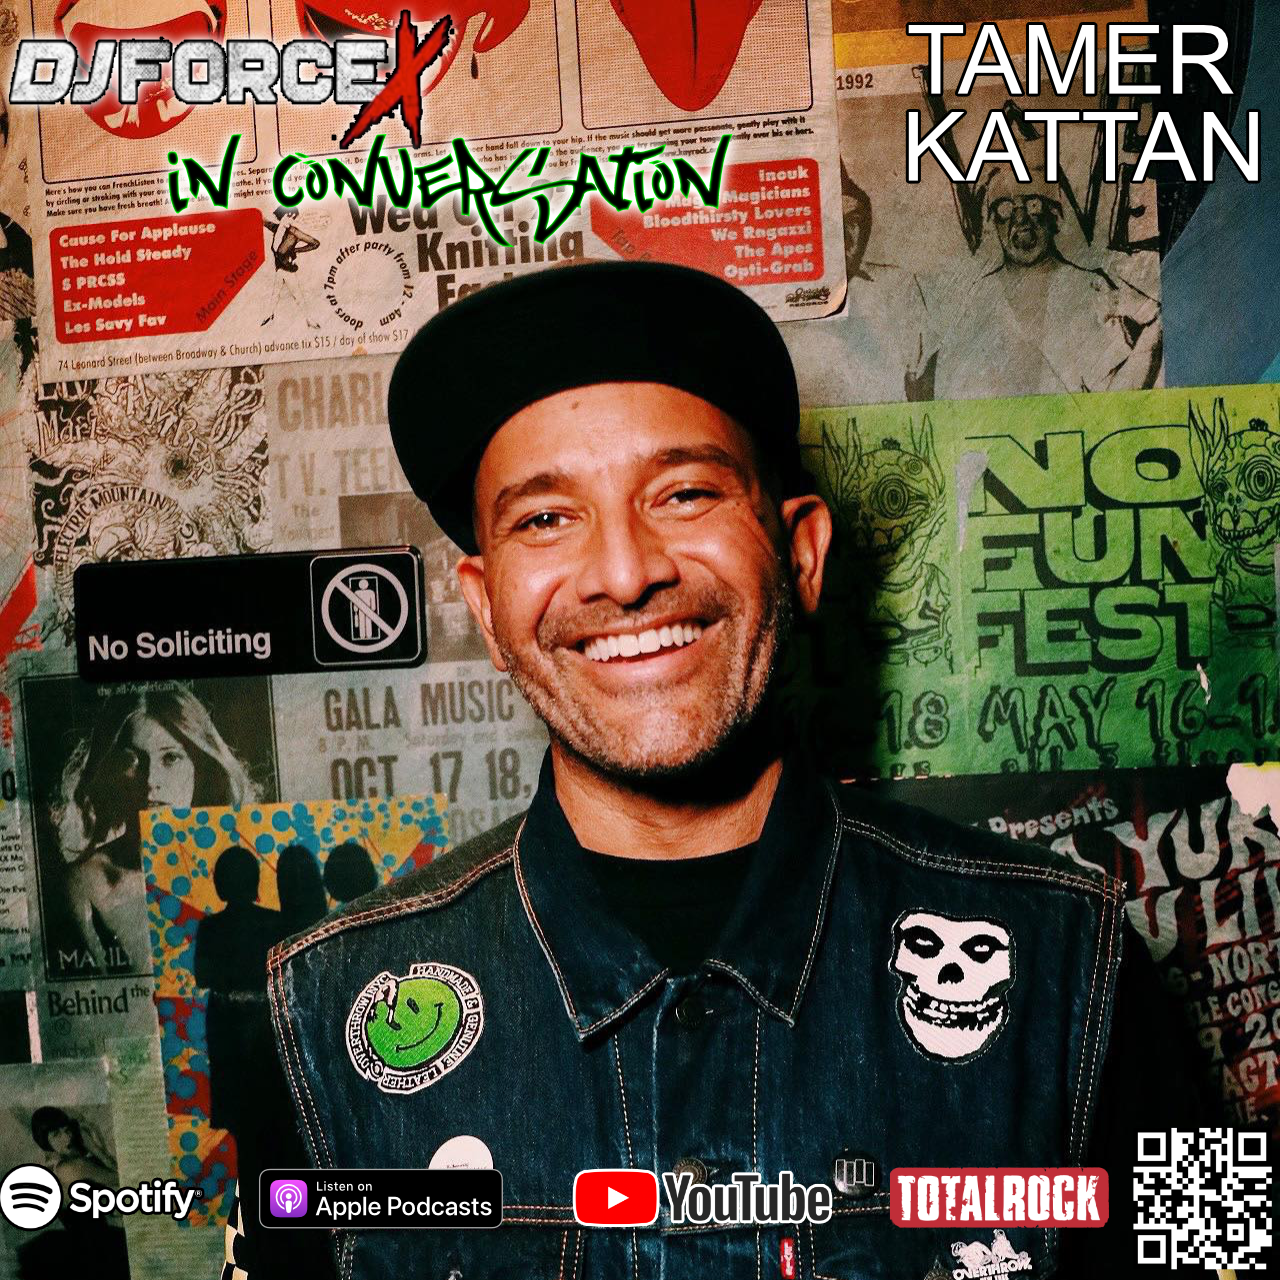 Tamer Kattan Podcast